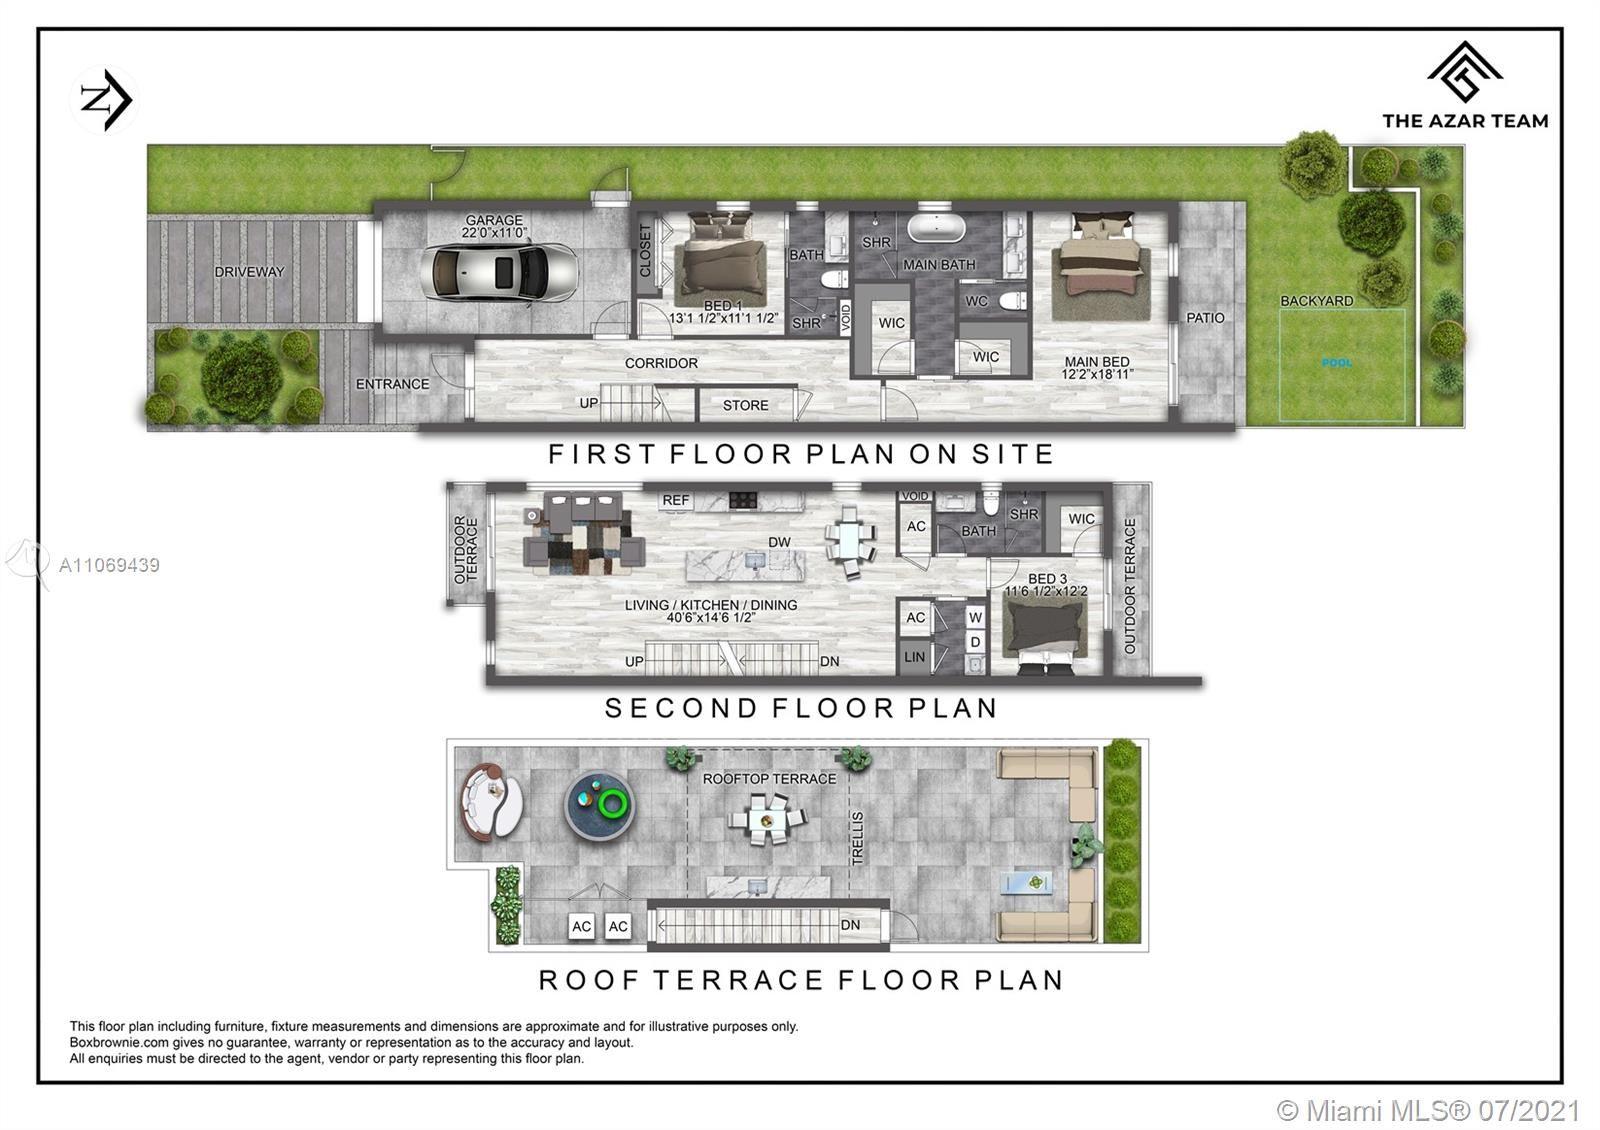 1375 SW 22nd Terrace #1, Miami, FL 33145 - #: A11069439